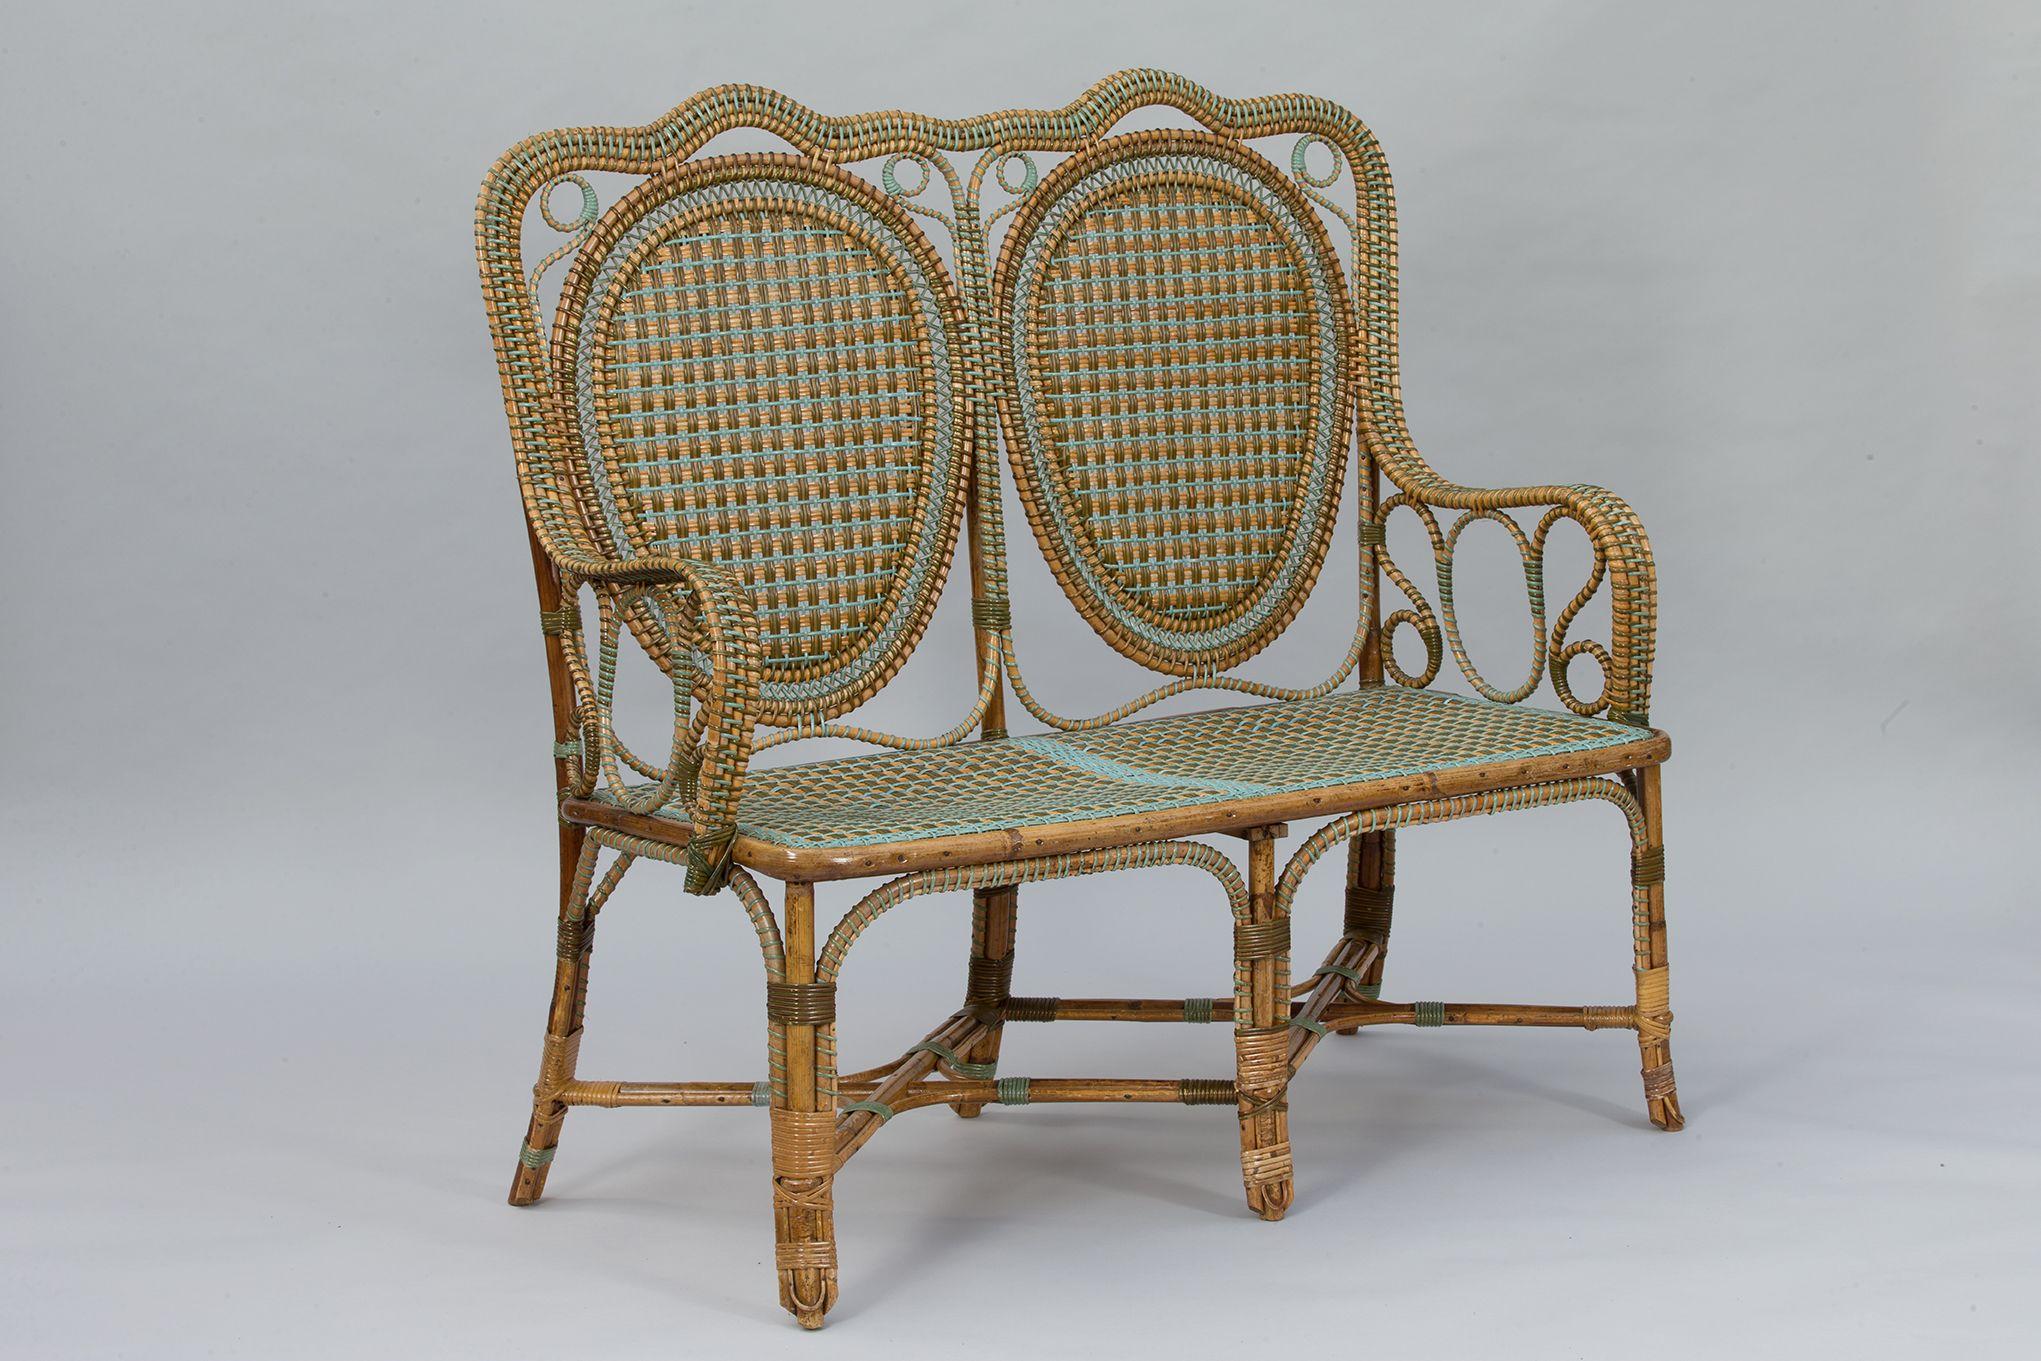 Galerie Vauclair Banquette Perret Vibert Lames Plates Bleu Mobilier Vintage Rotin Conservatorygreenhouse Wicker Furniture Rattan Sofa Rattan Furniture